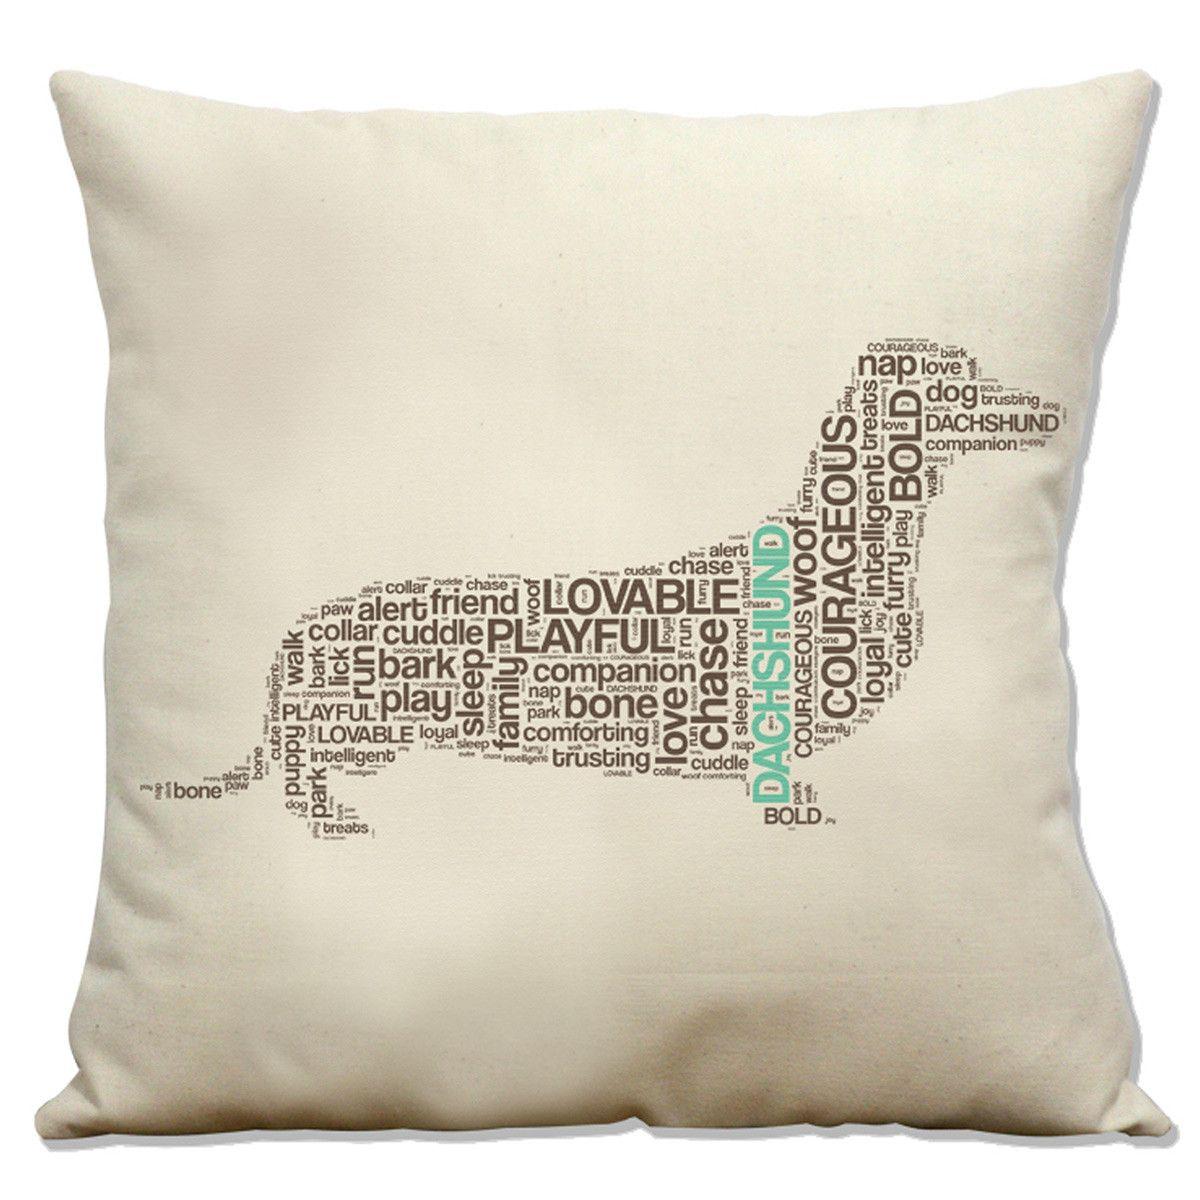 dachshund pillow  interior design  pinterest  thoughts  - dachshund pillow